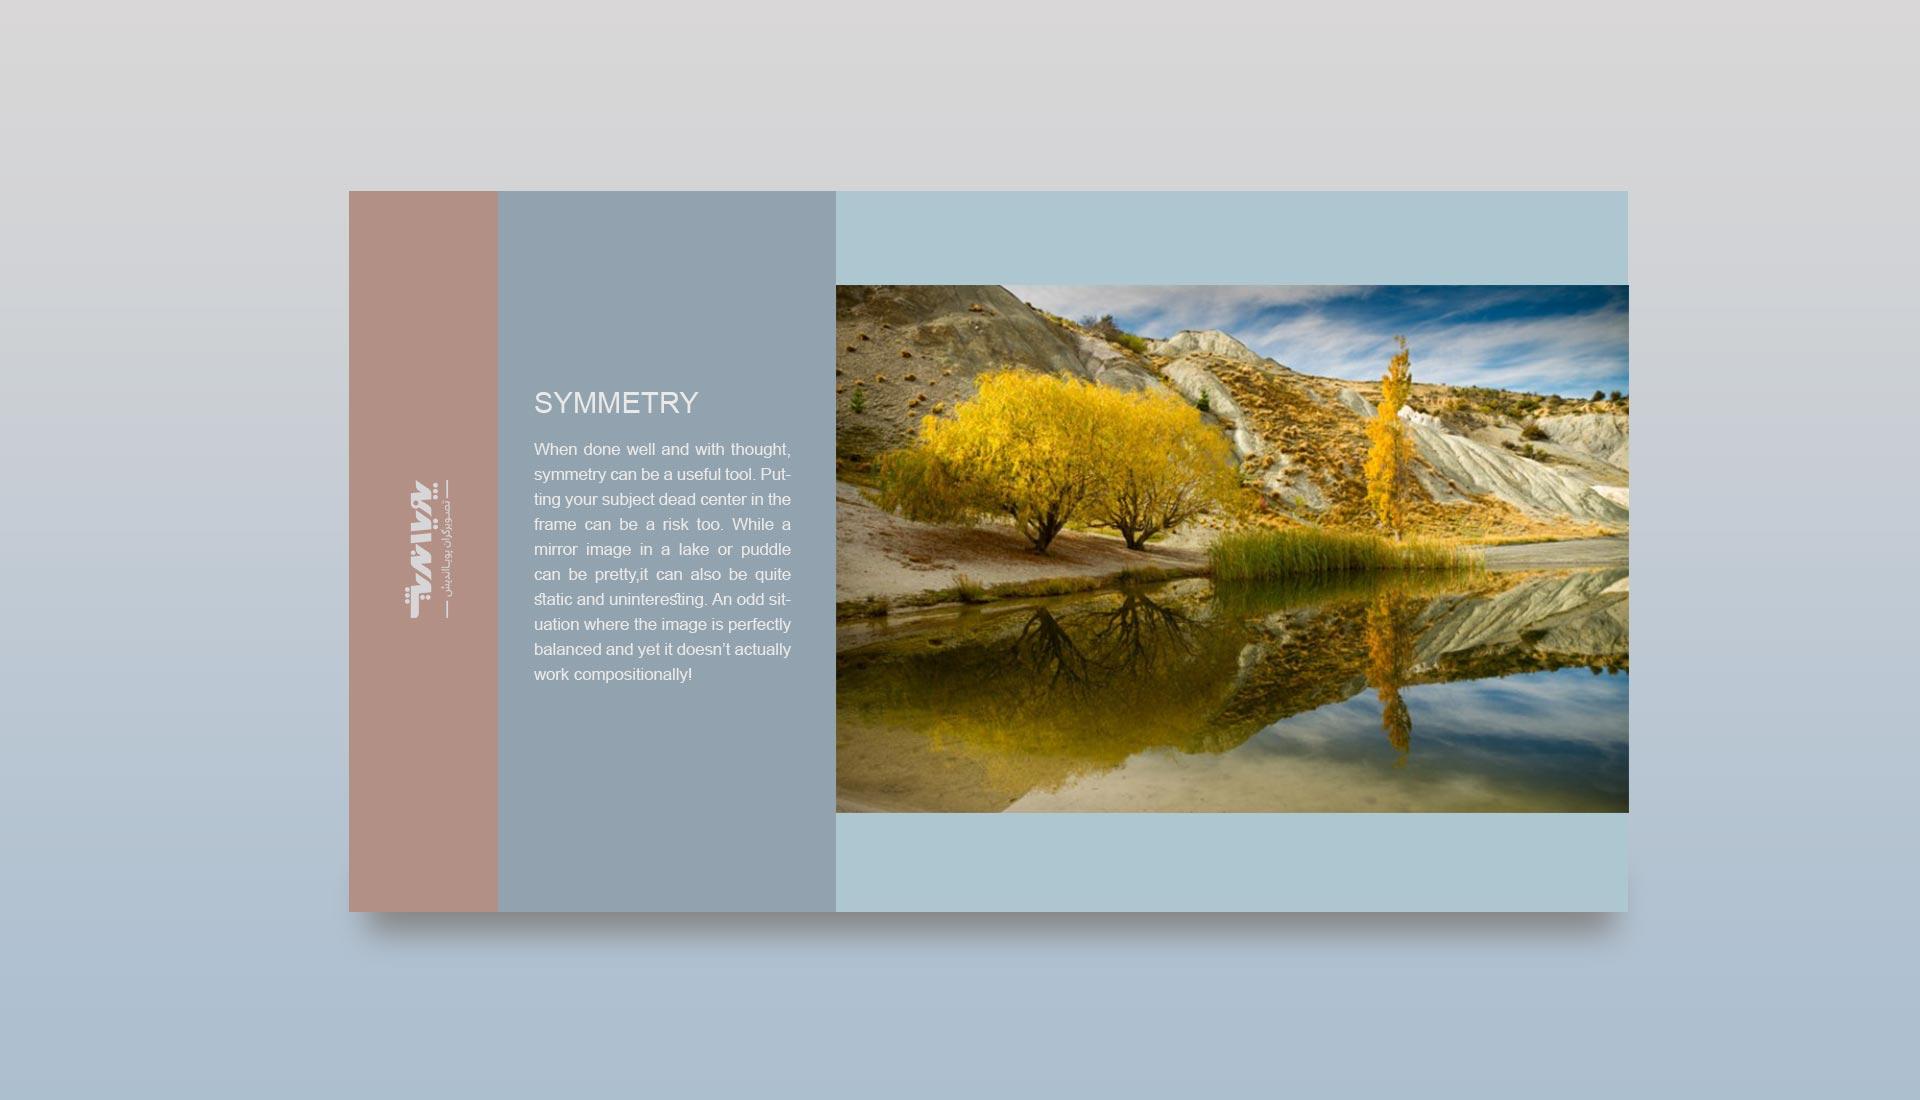 SYMMETRY photo - تعادل در عکاسی